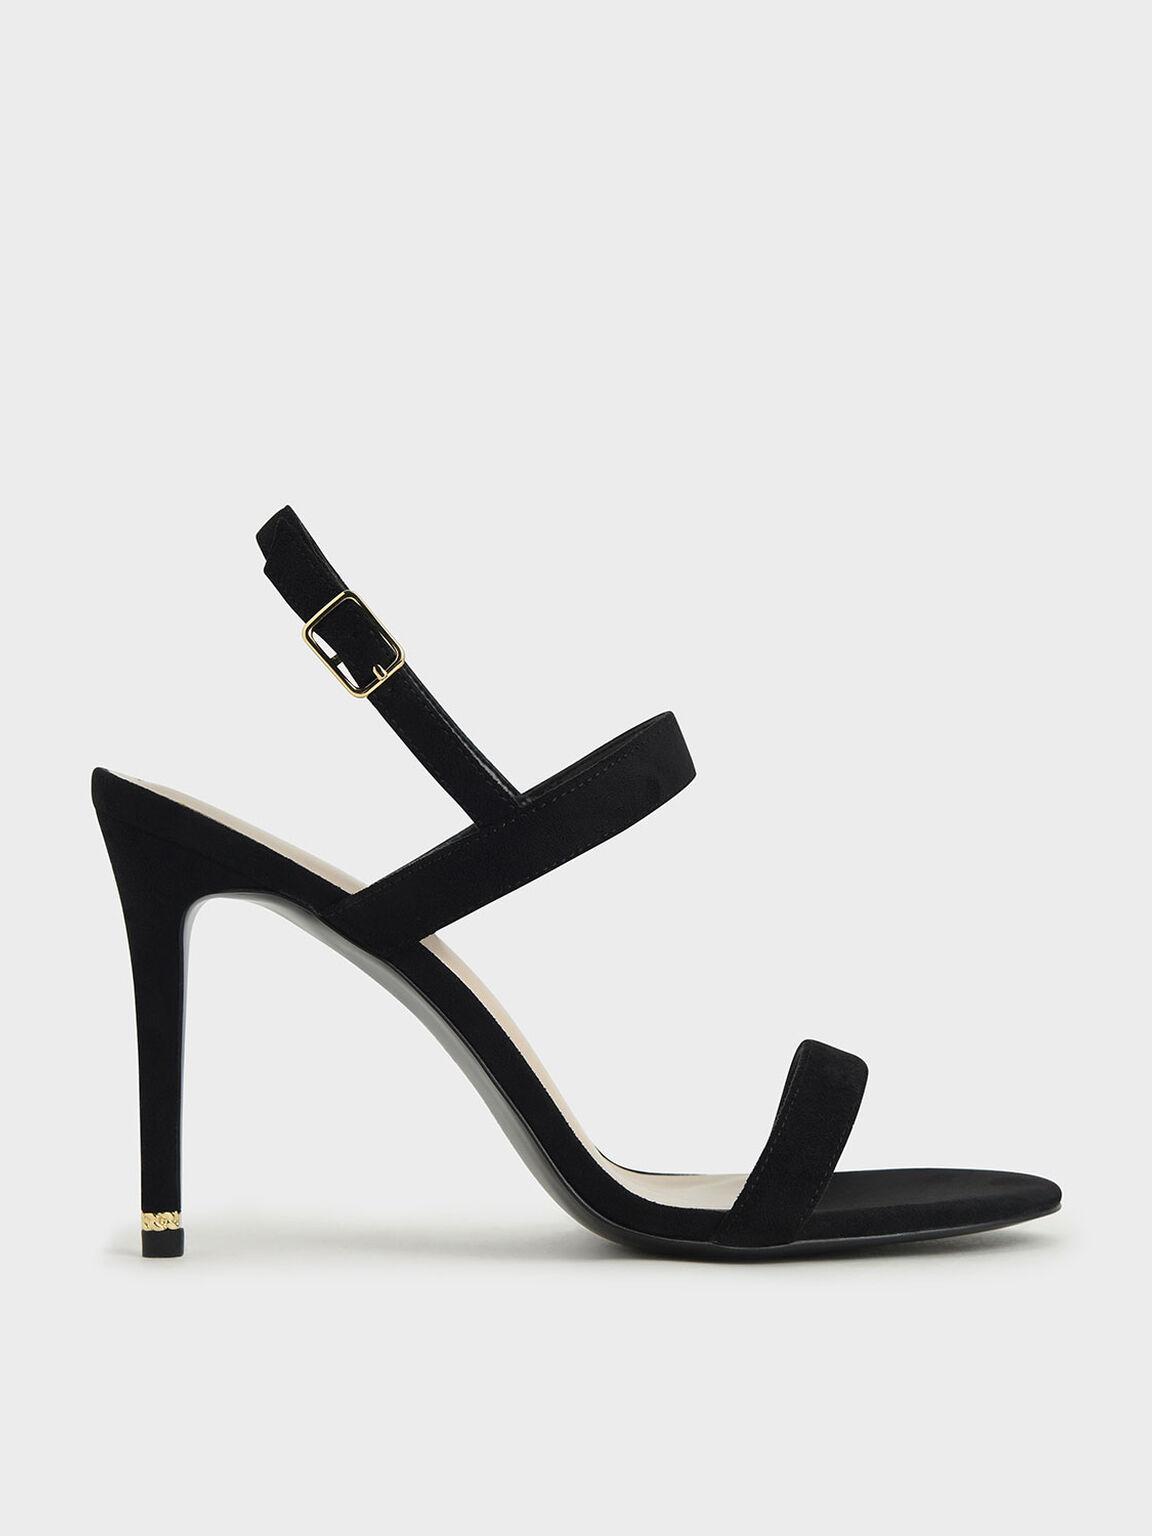 Textured Ankle Strap Stiletto Sandals, Black, hi-res